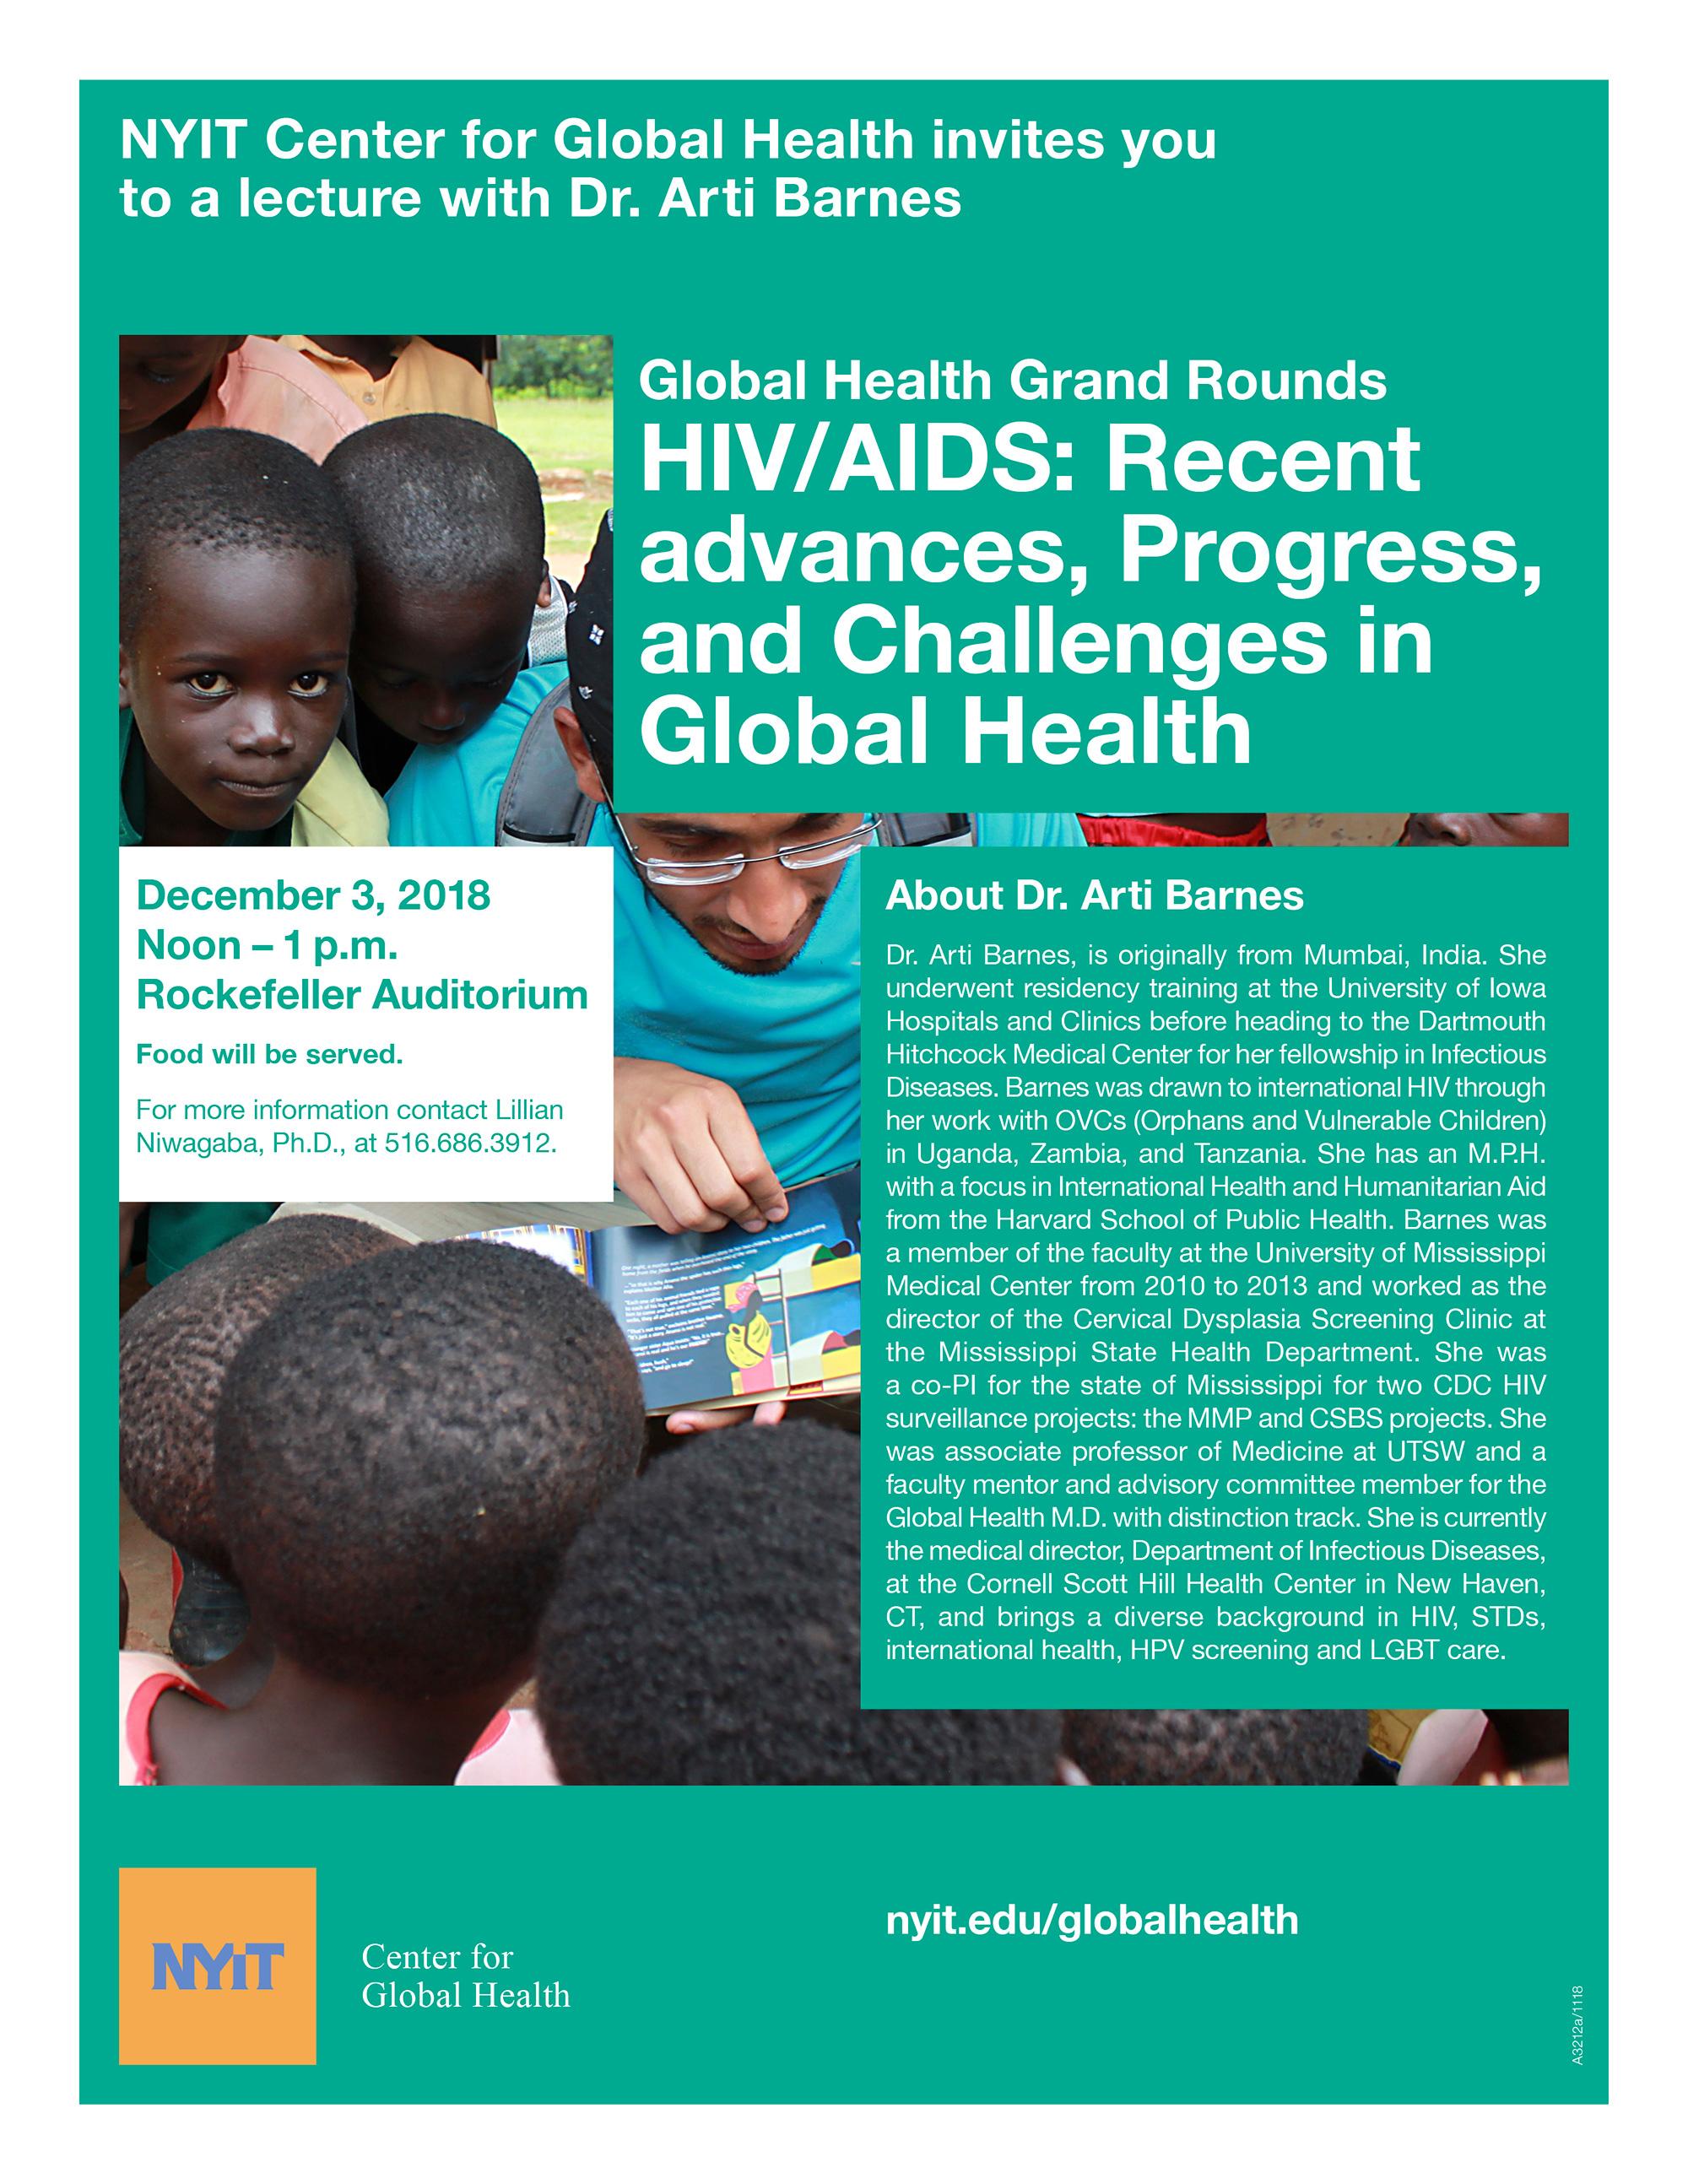 A3212a_Global_Health_Challenges_Evite_December.jpg